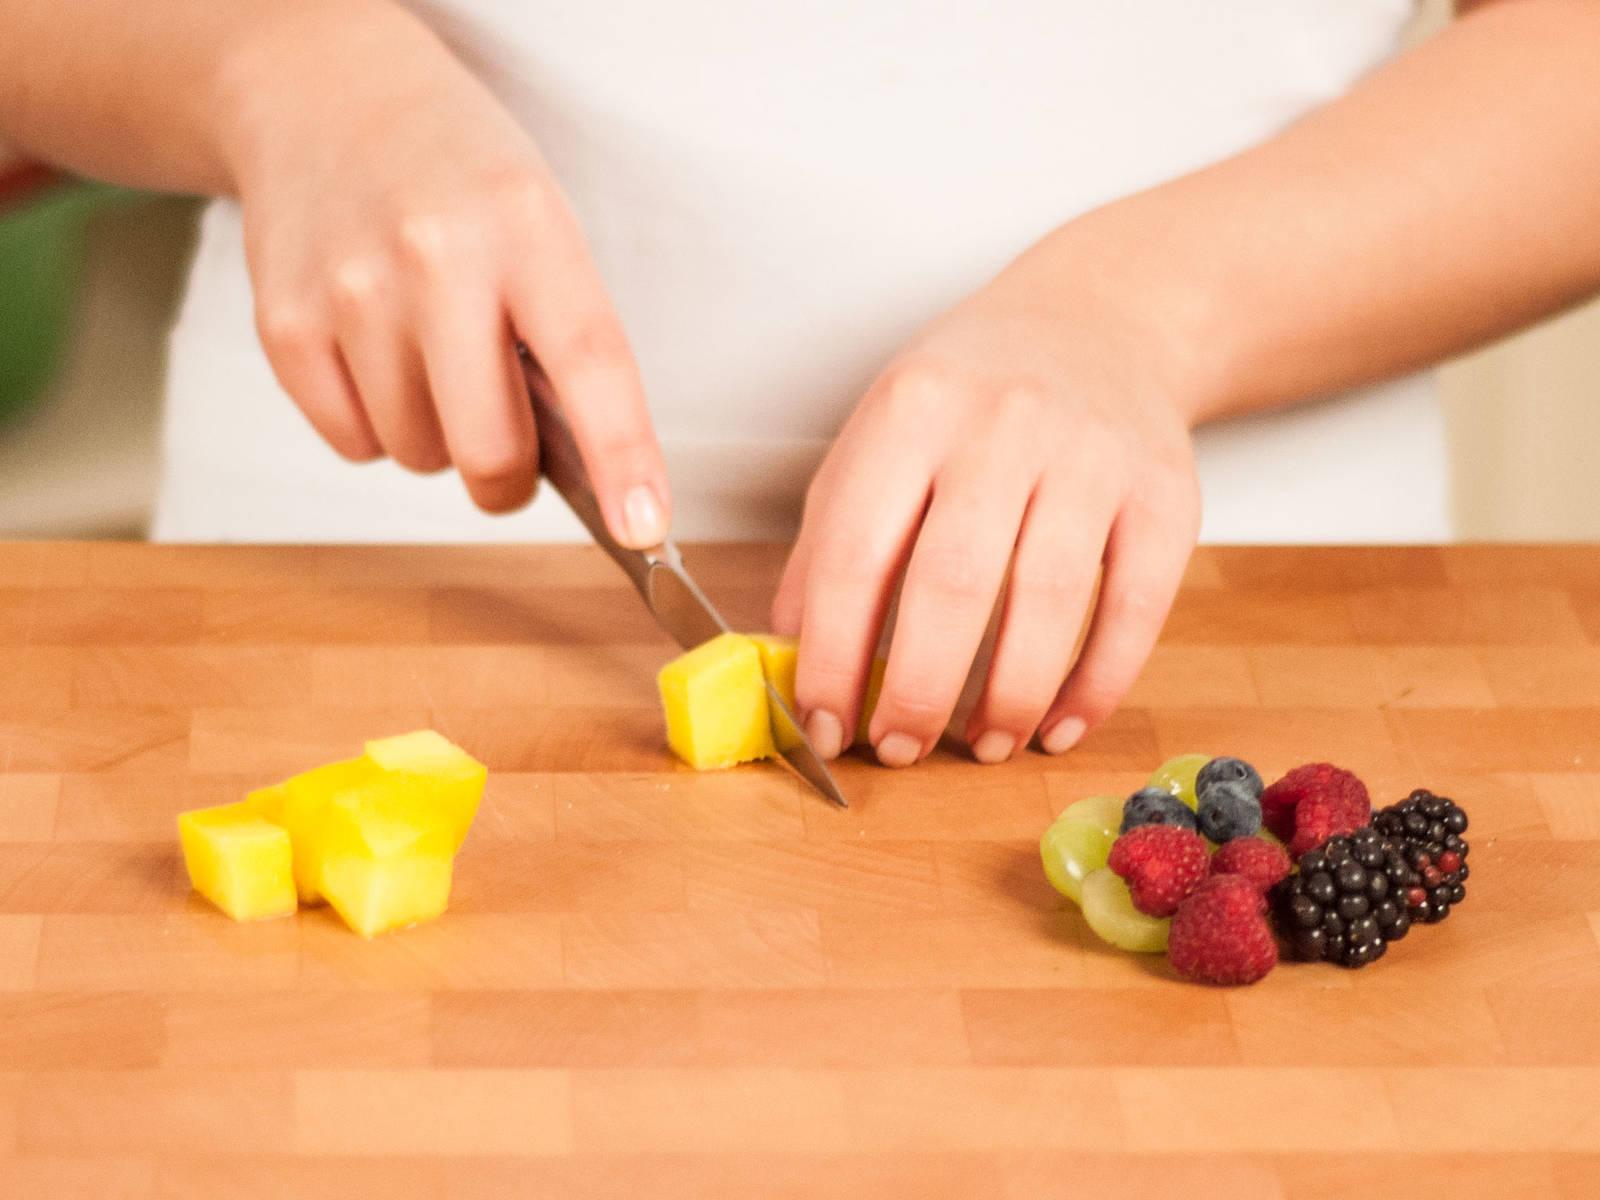 Set berries aside. Halve grapes. Peel mango and cut into cubes.